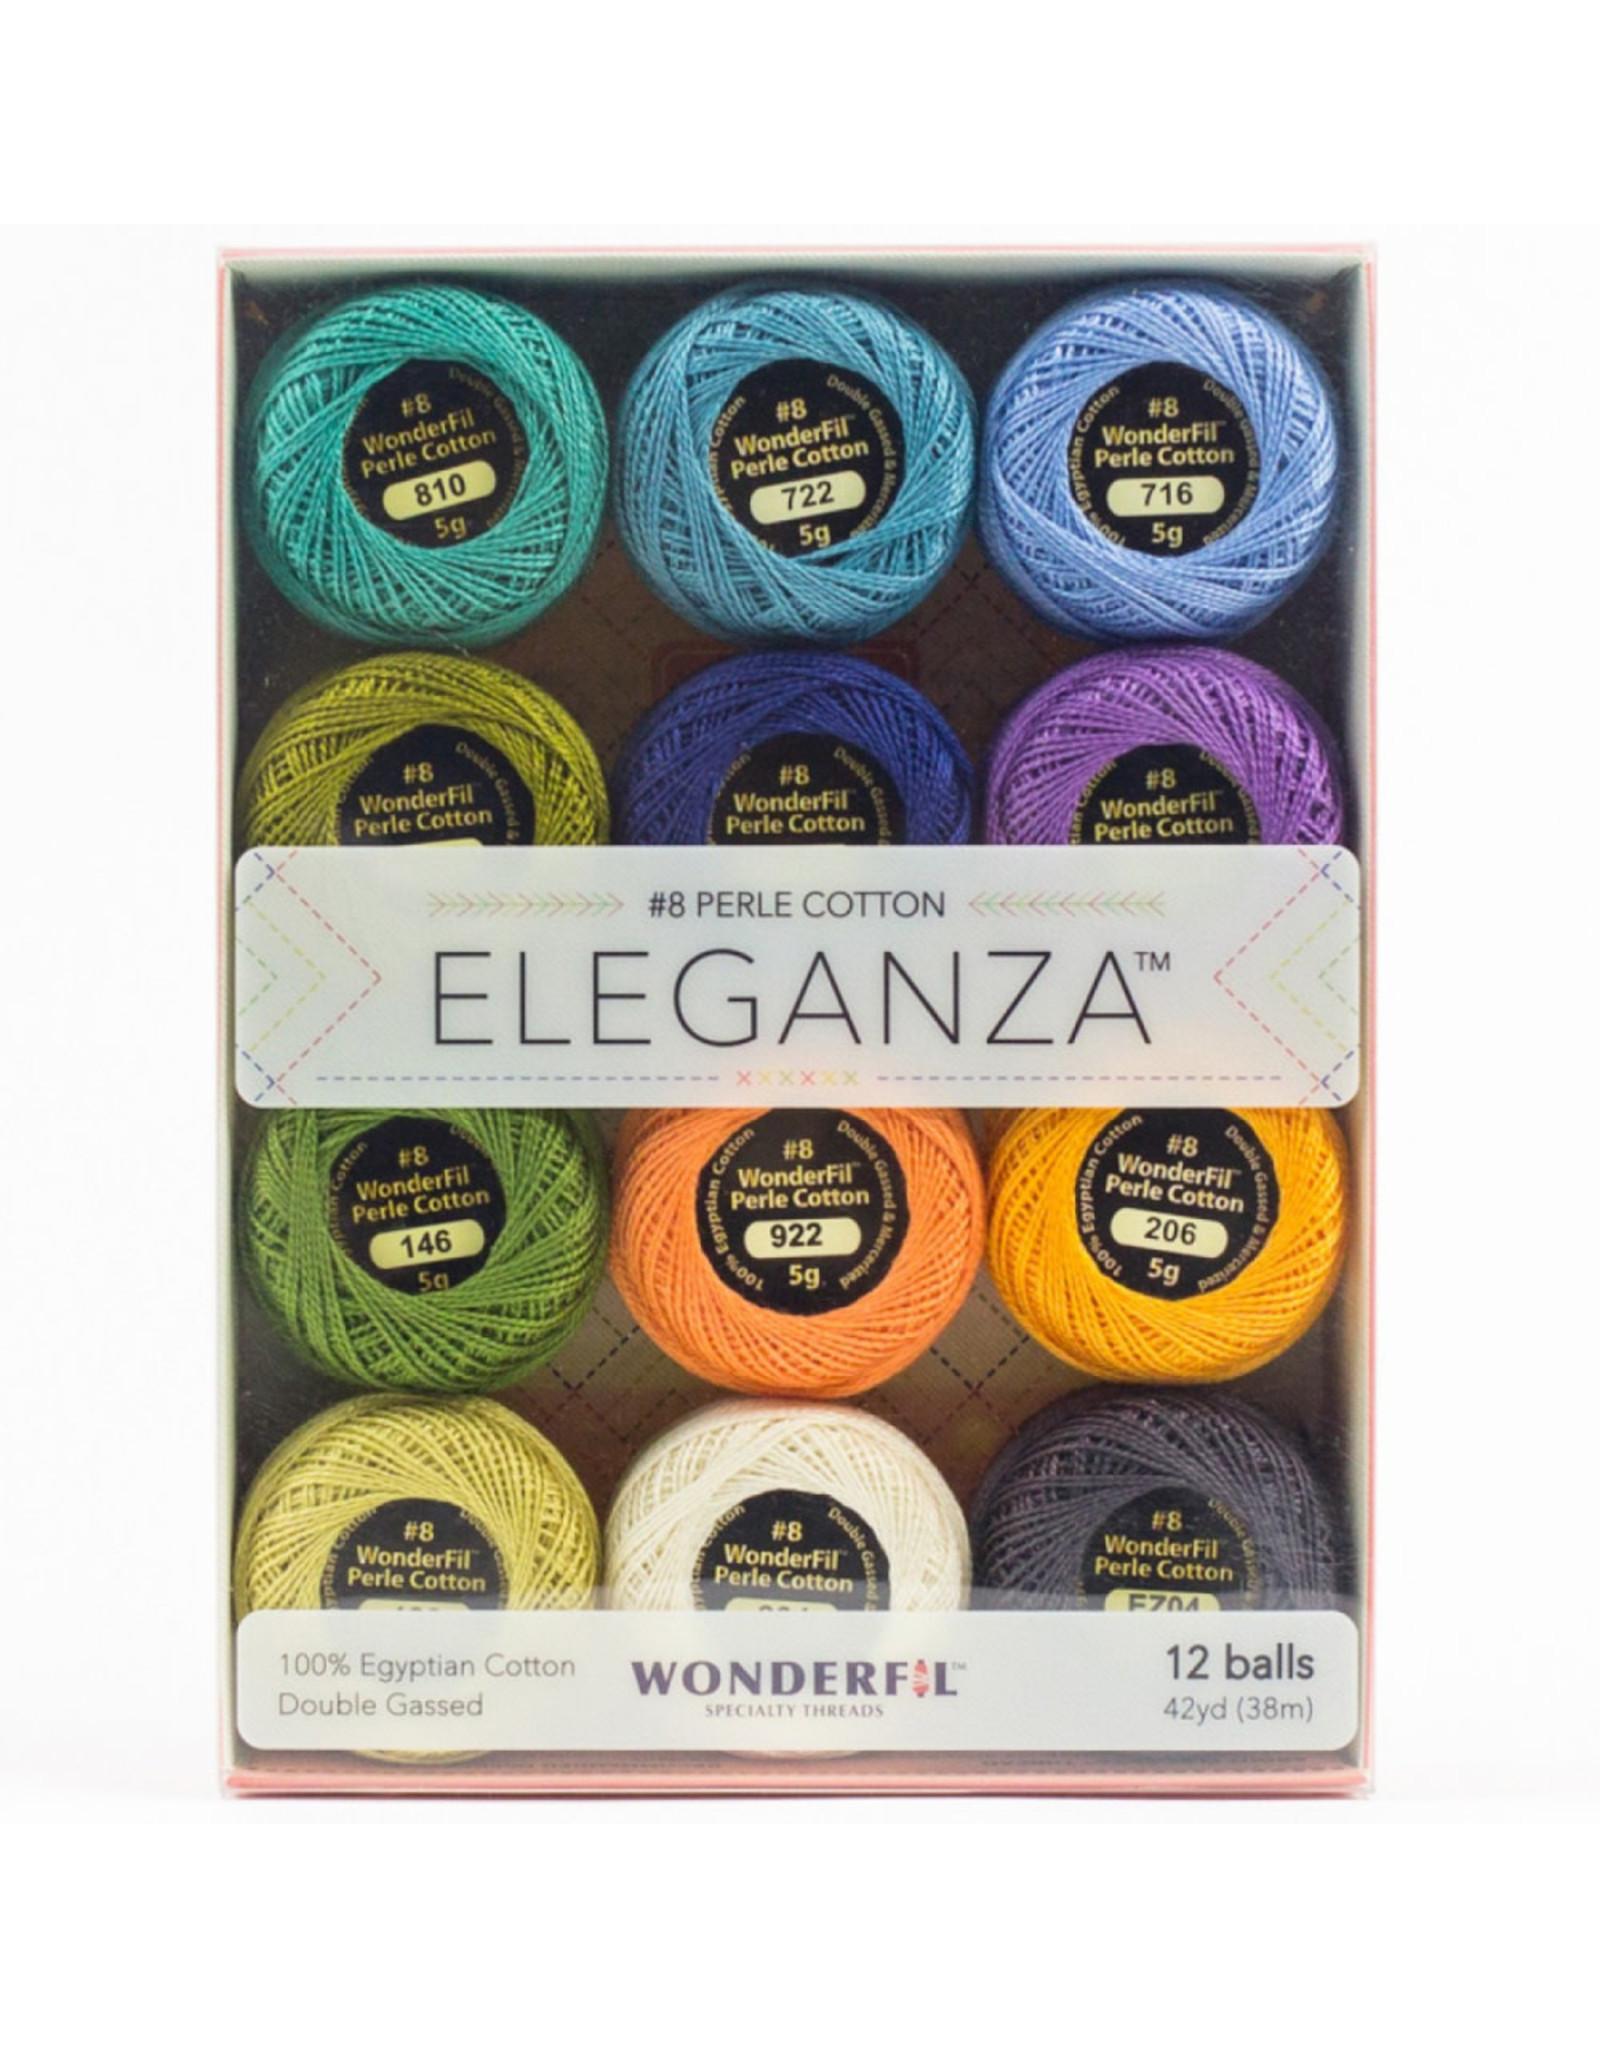 WonderFil Eleganza Coral Reef, Perle (Pearl) Cotton, Set of 12 Size 8 from WonderFil